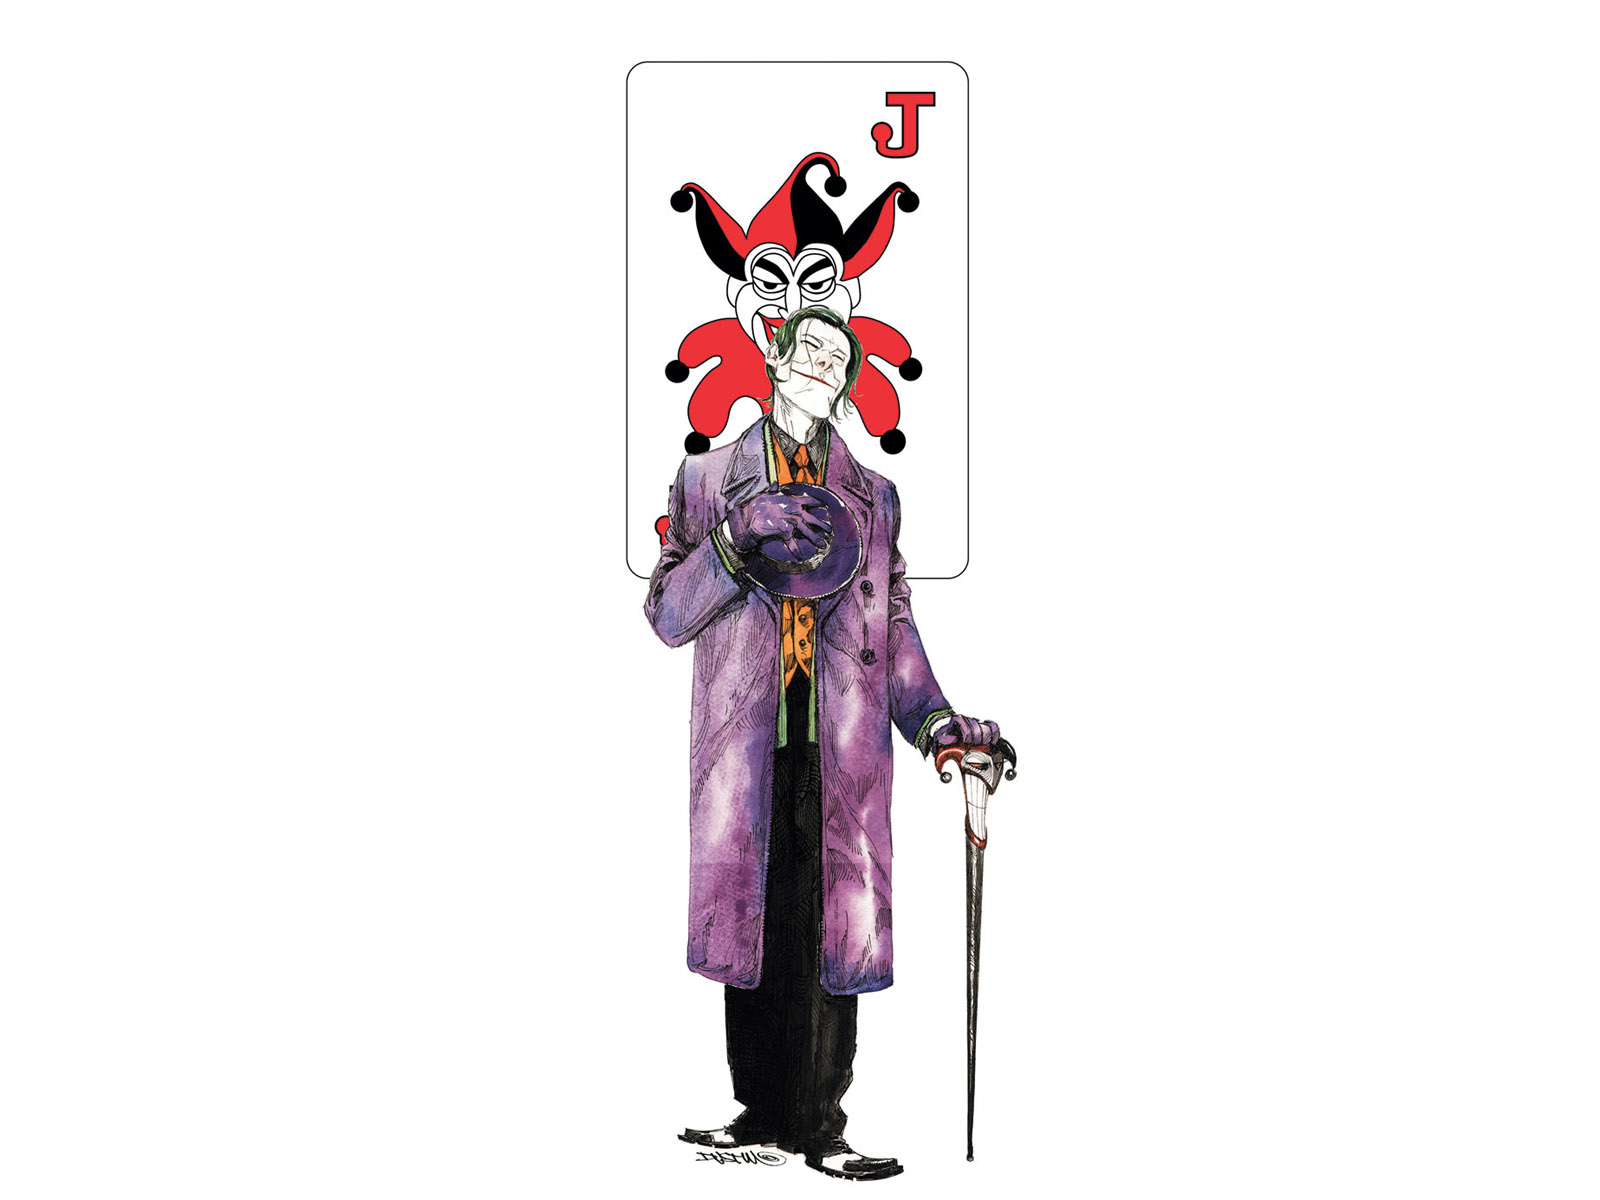 Iphone 5 Wallpaper Cool 小丑 壁纸 And 背景 1600x1200 Id 97725